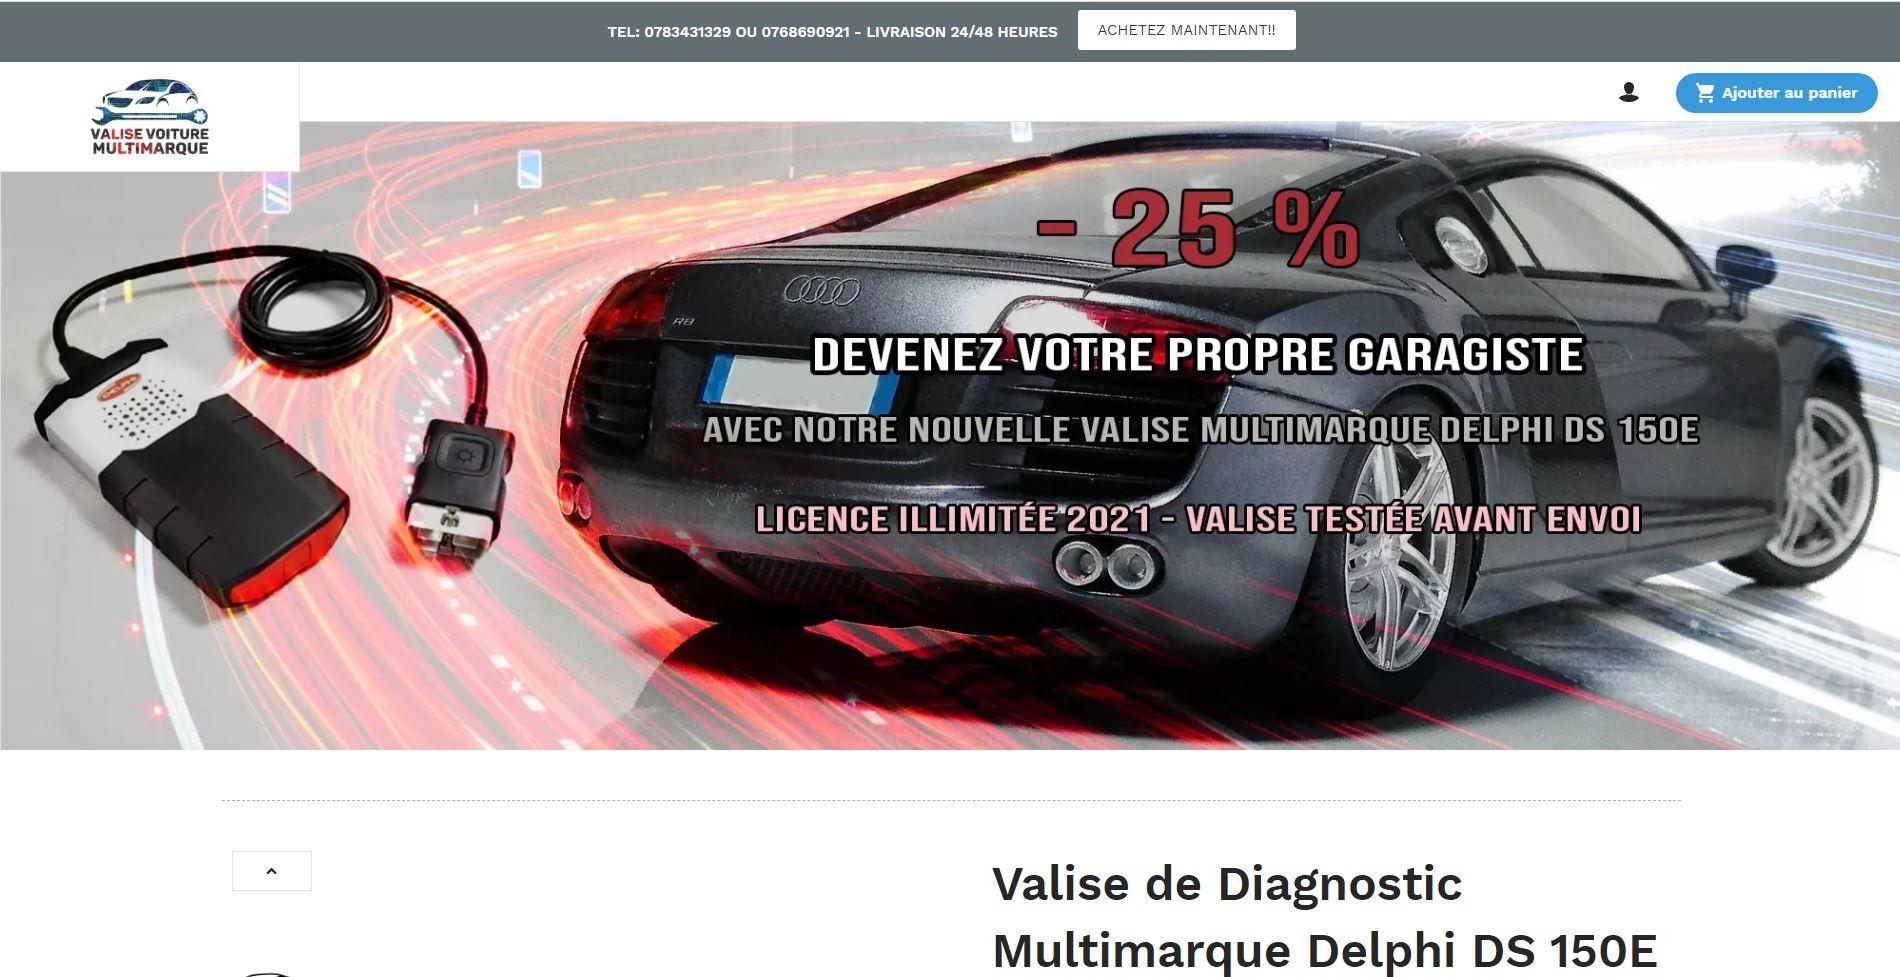 valise de diagnostic automobile (@valisevoituremultimarque) Cover Image